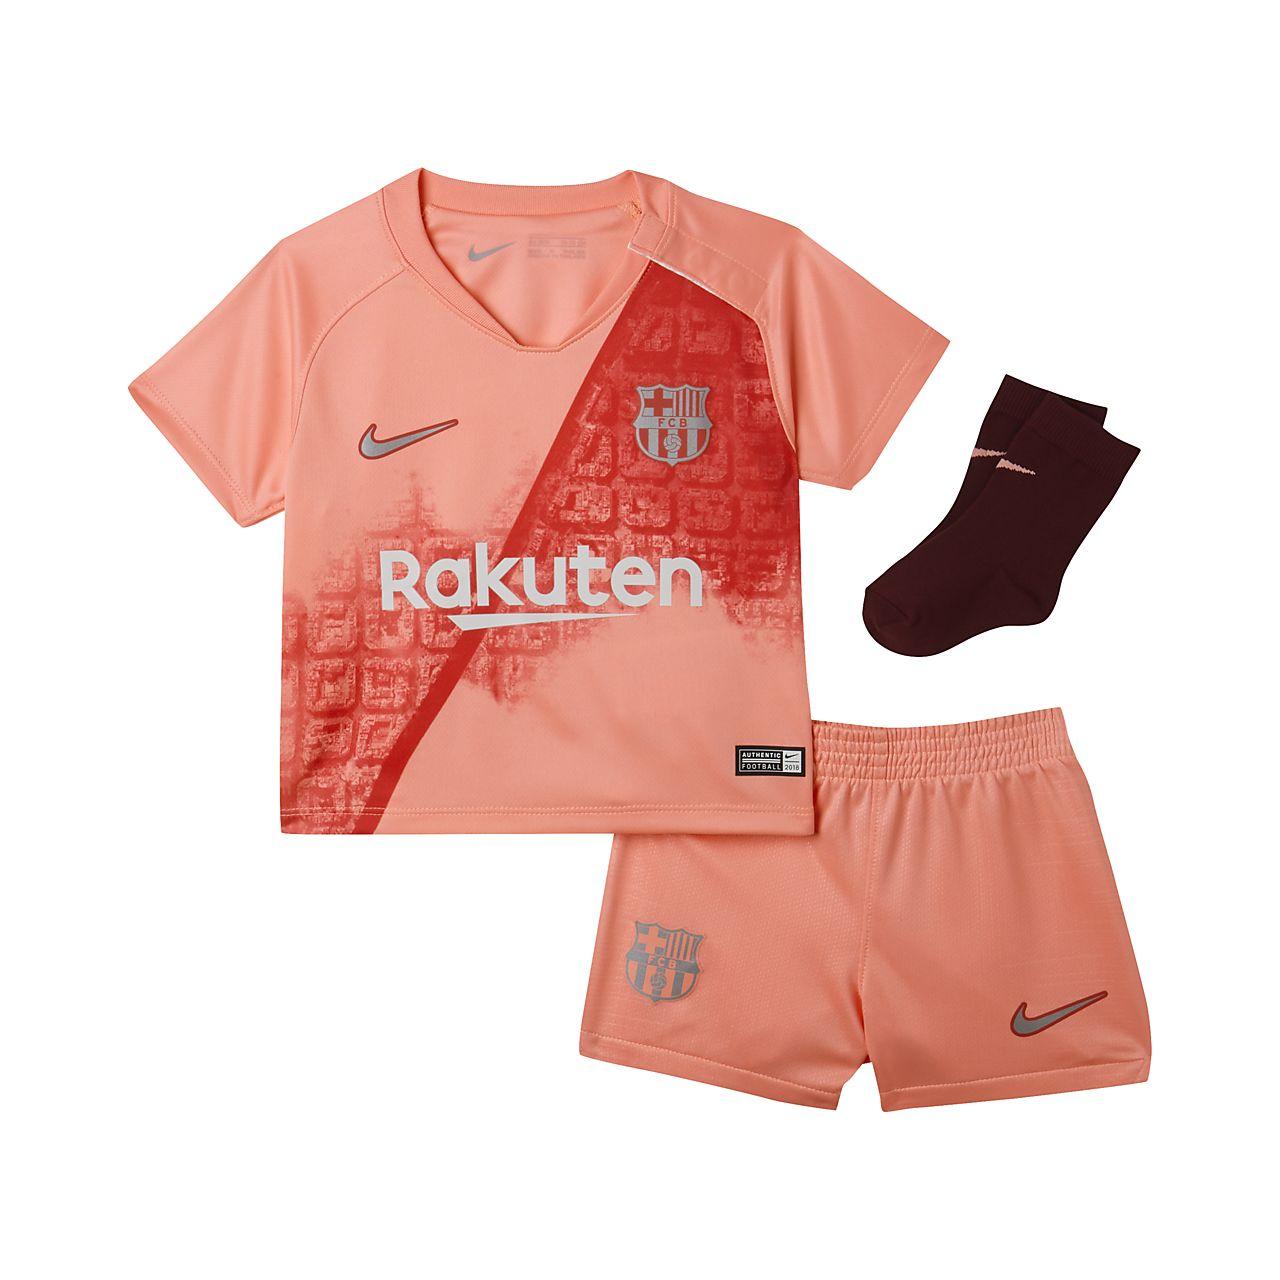 ae08e9c0e 2018 19 FC Barcelona Stadium Third Baby and Toddler Football Kit ...